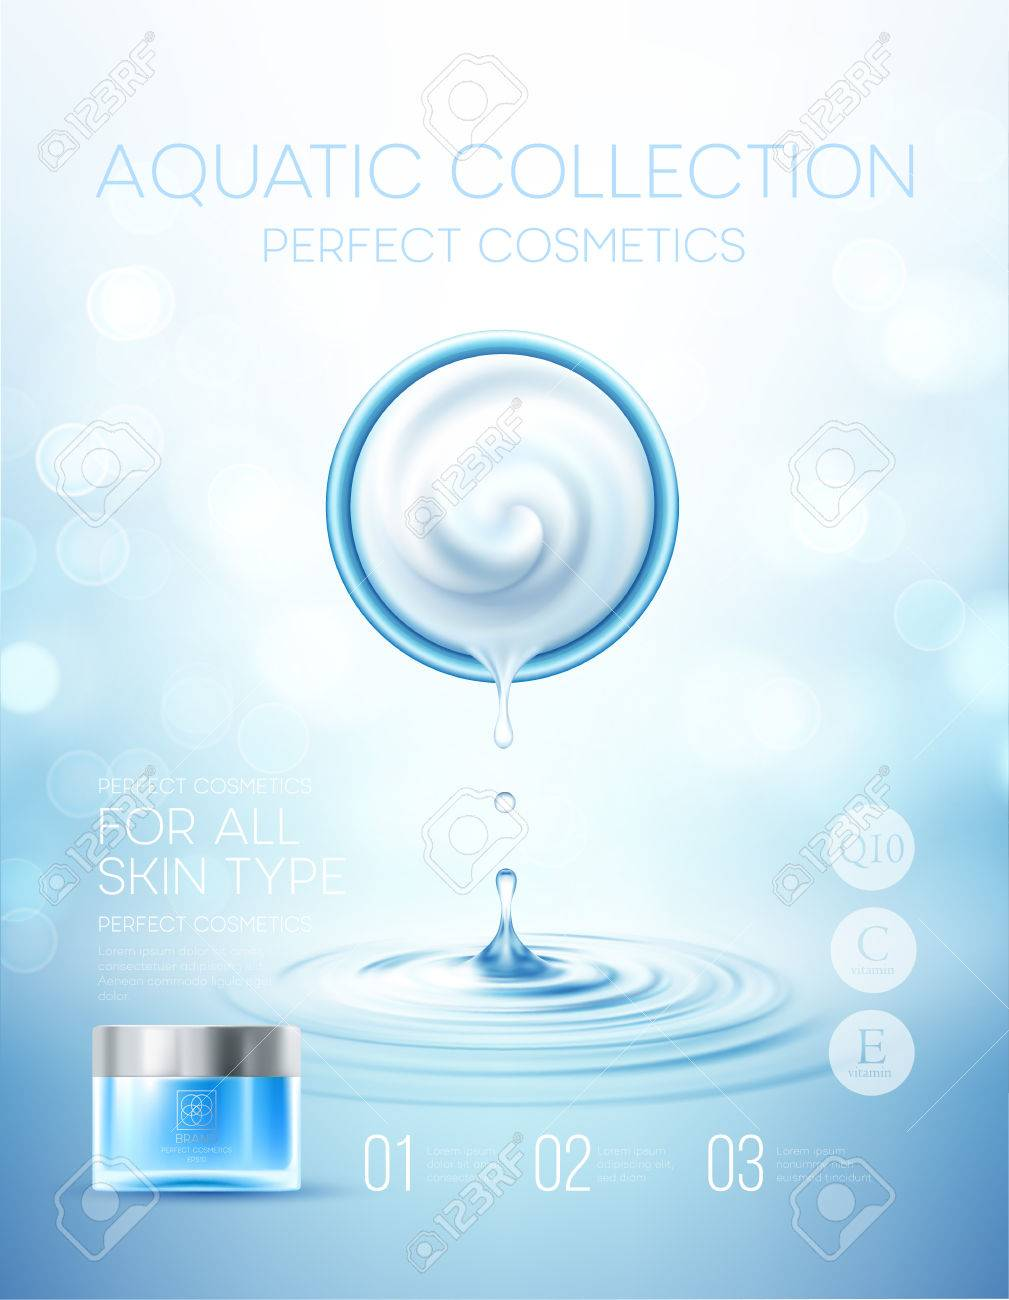 Design cosmetics product advertising. Vector illustration - 78765810